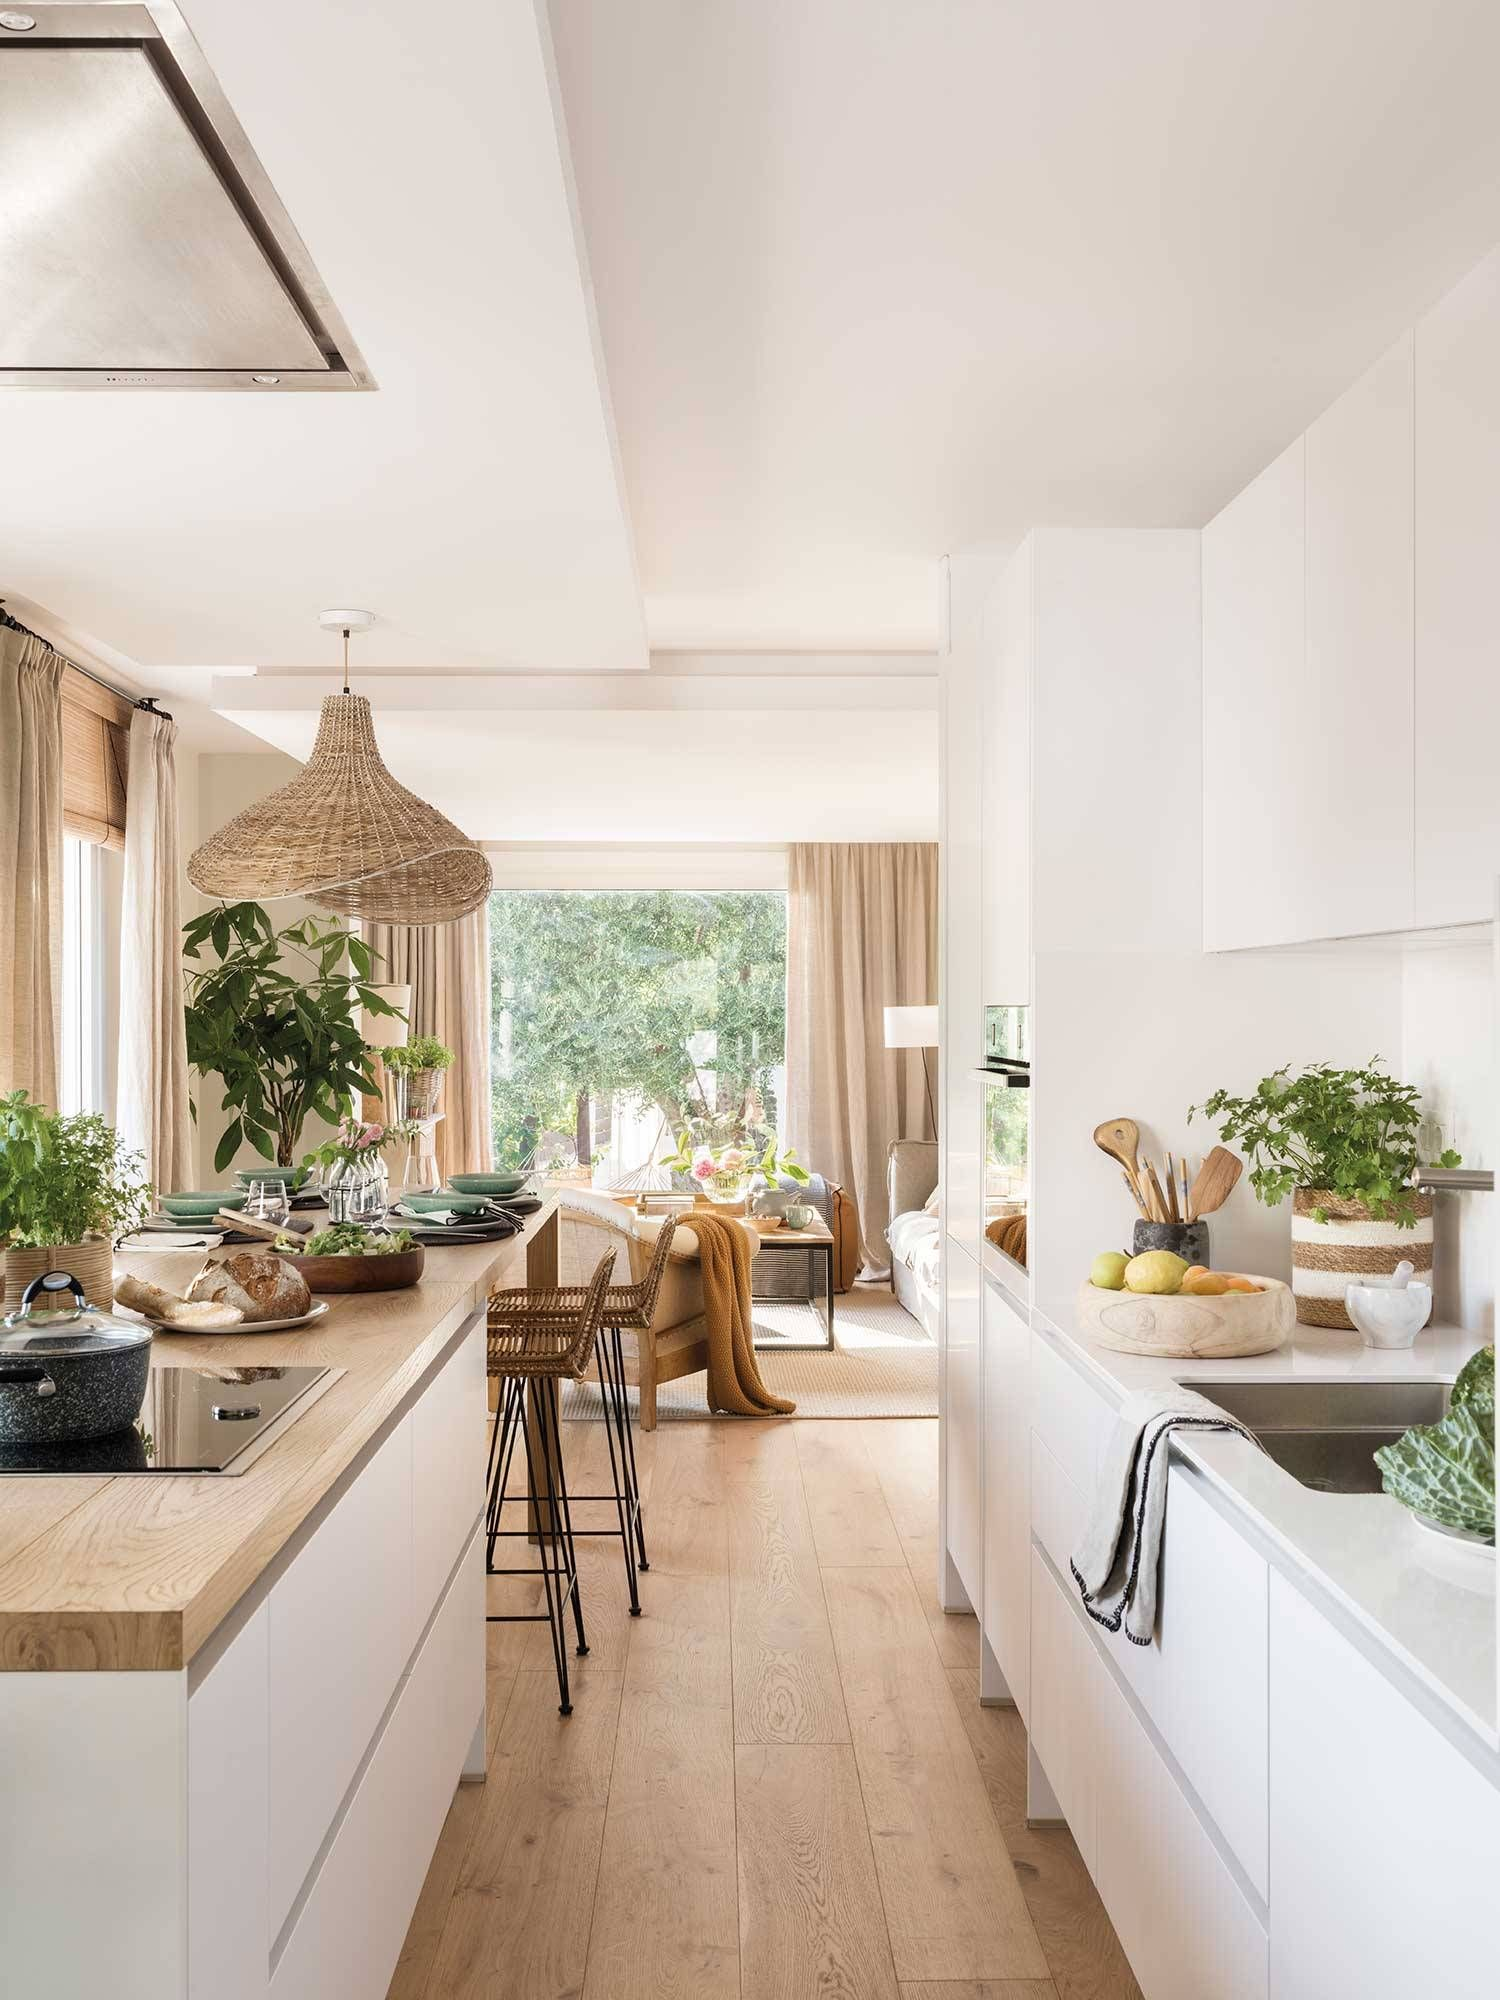 30 cocinas modernas blancas con muchas ideas decorativas